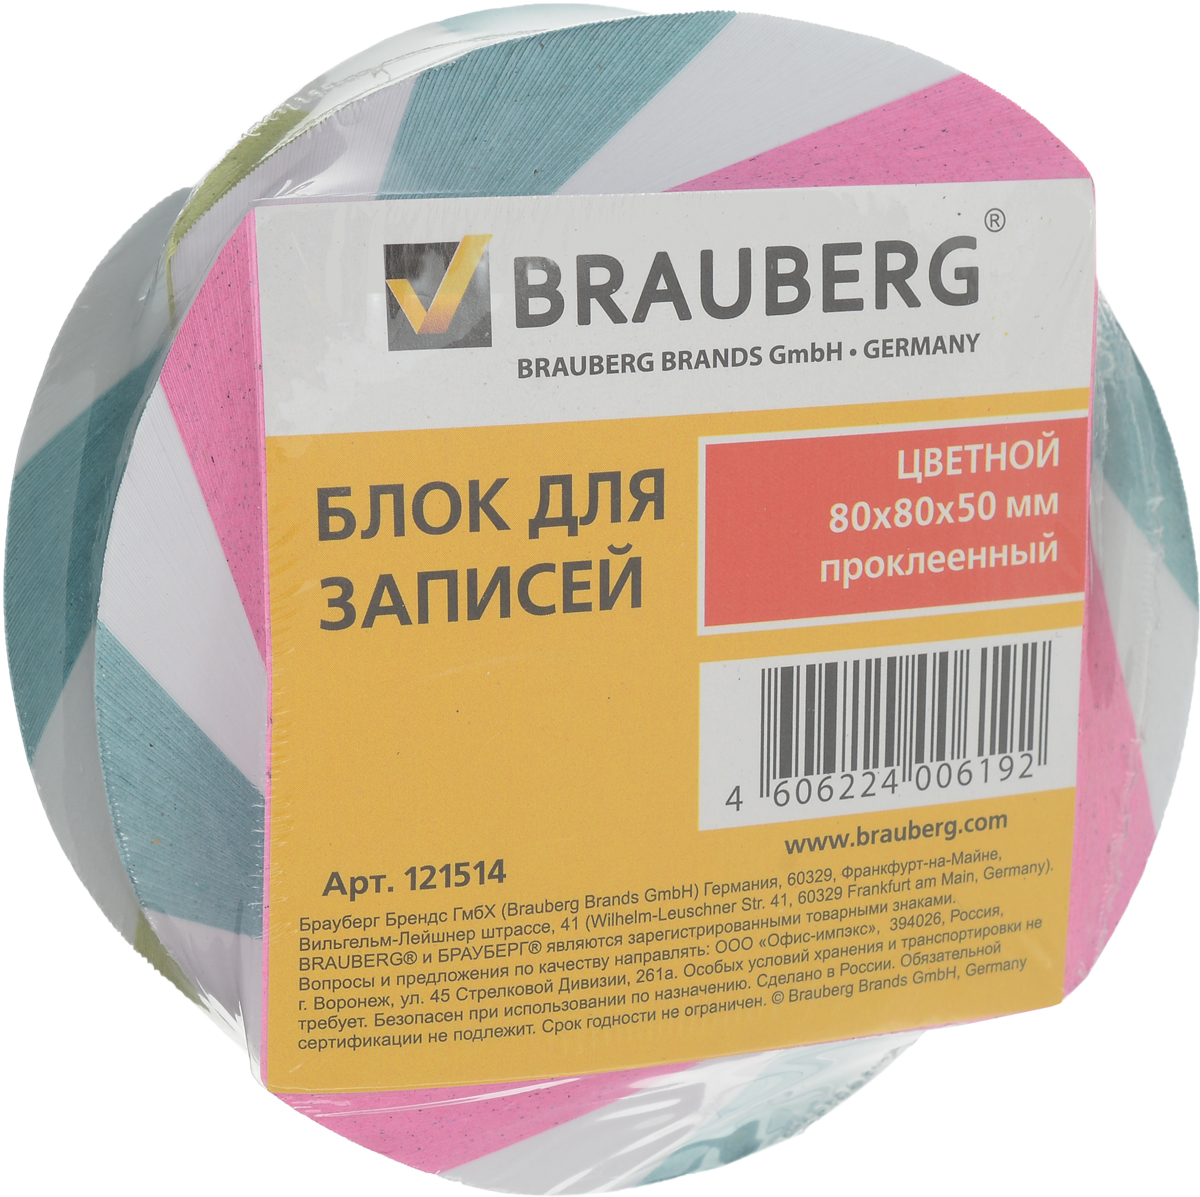 Brauberg Бумага для заметок 8 х 8 см цвет розовый белый зеленый салатовый 500 листов brauberg доска пробковая 60 х 90 см